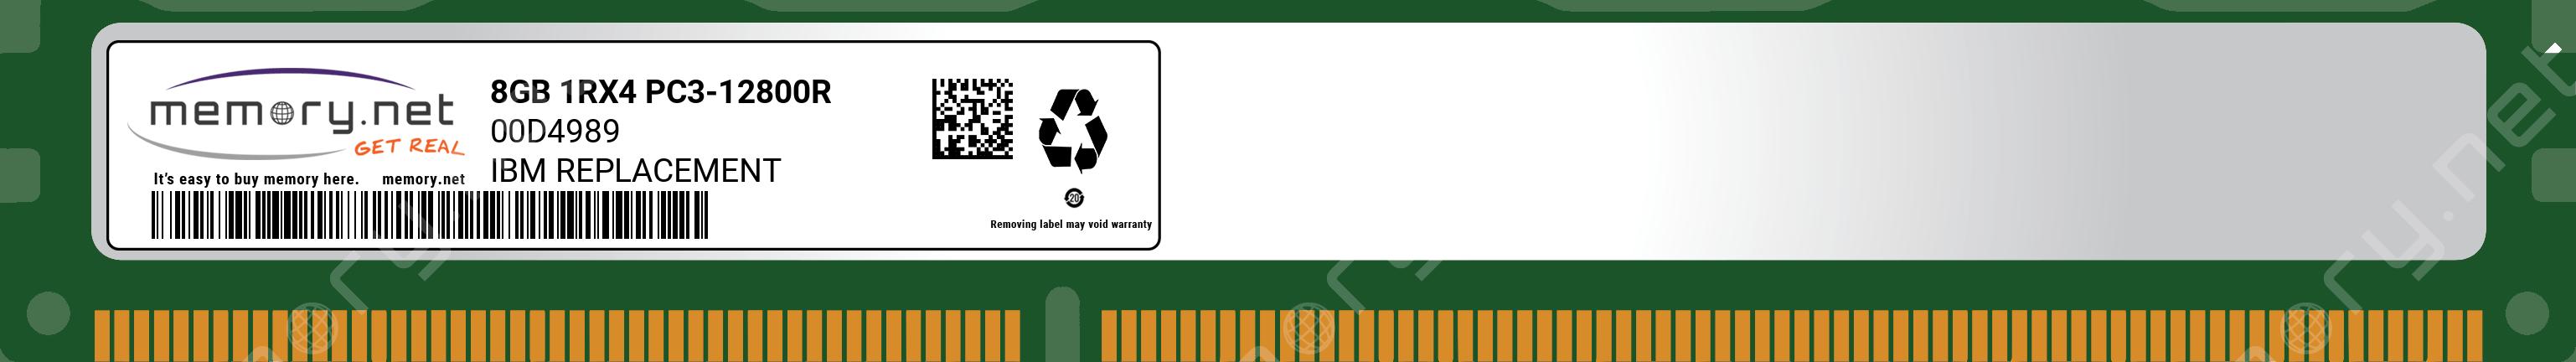 00D4989